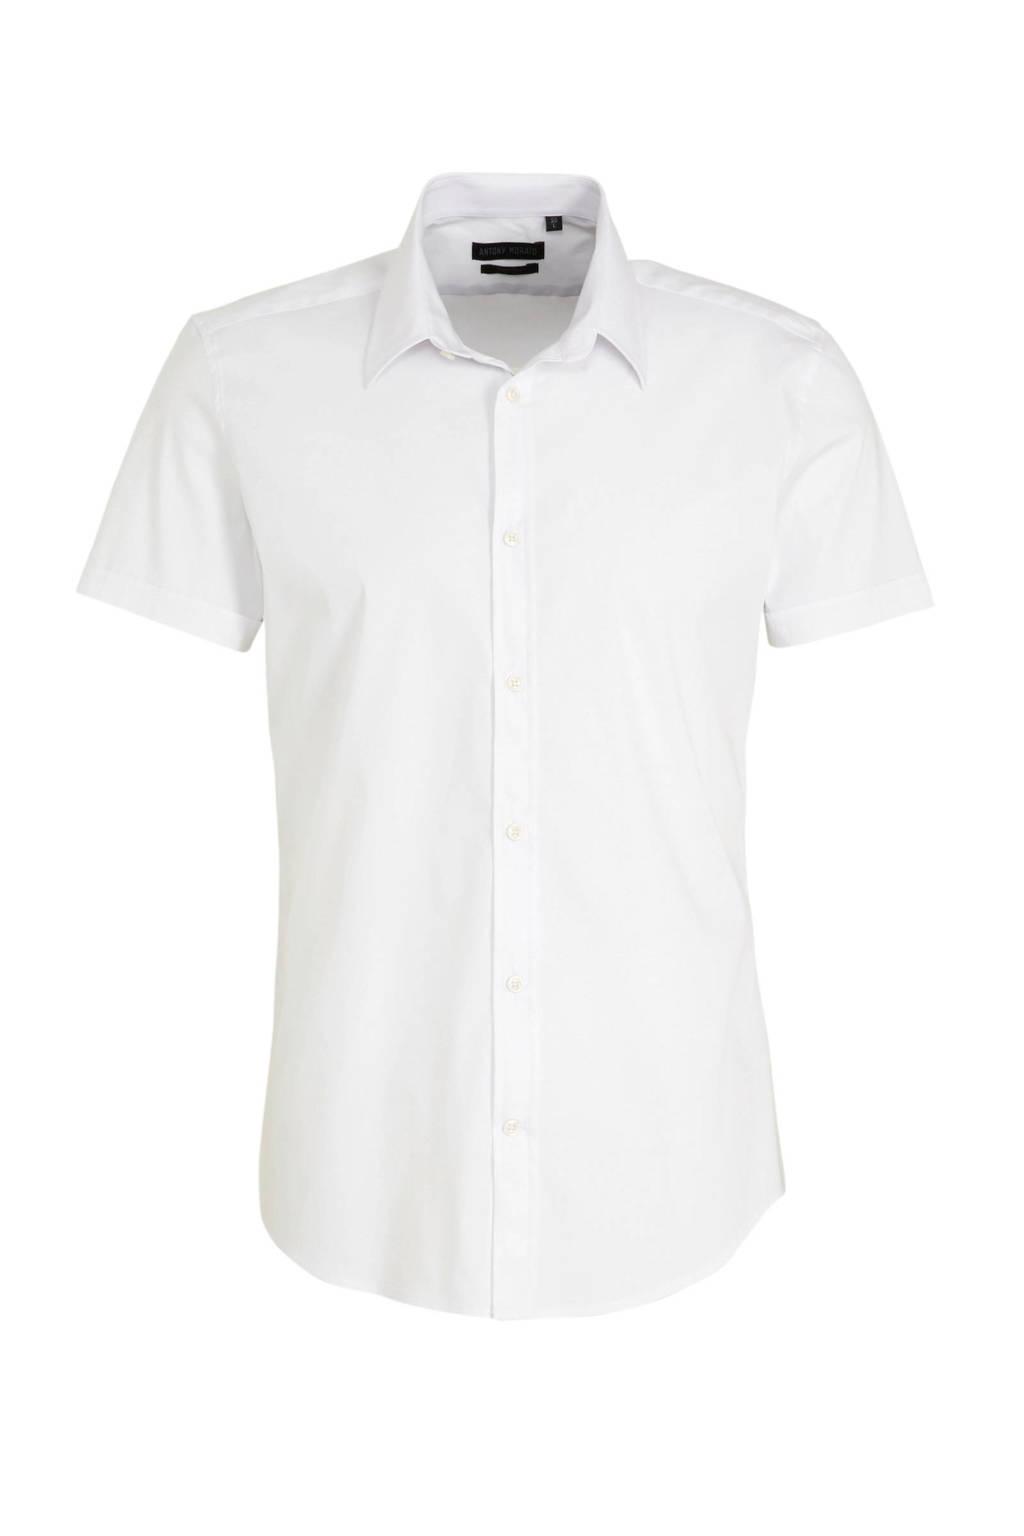 Antony Morato super slim fit overhemd wit, Wit